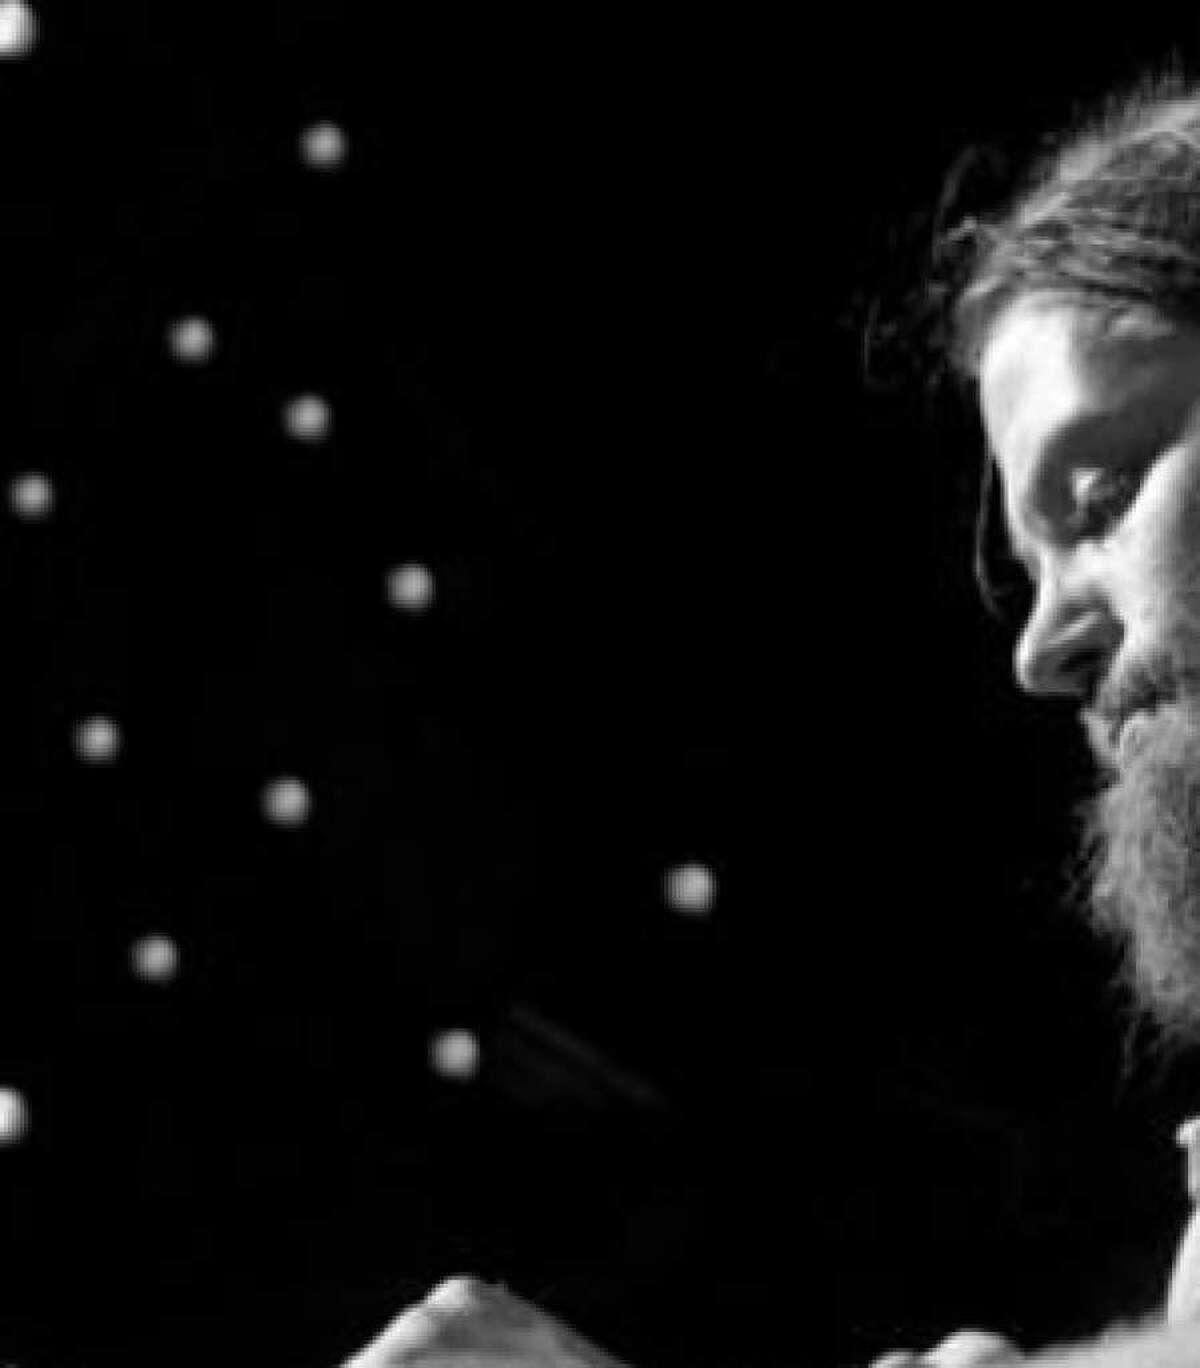 McPullish joins a reggae night of dance music at Pedicab Bar on Saturday.